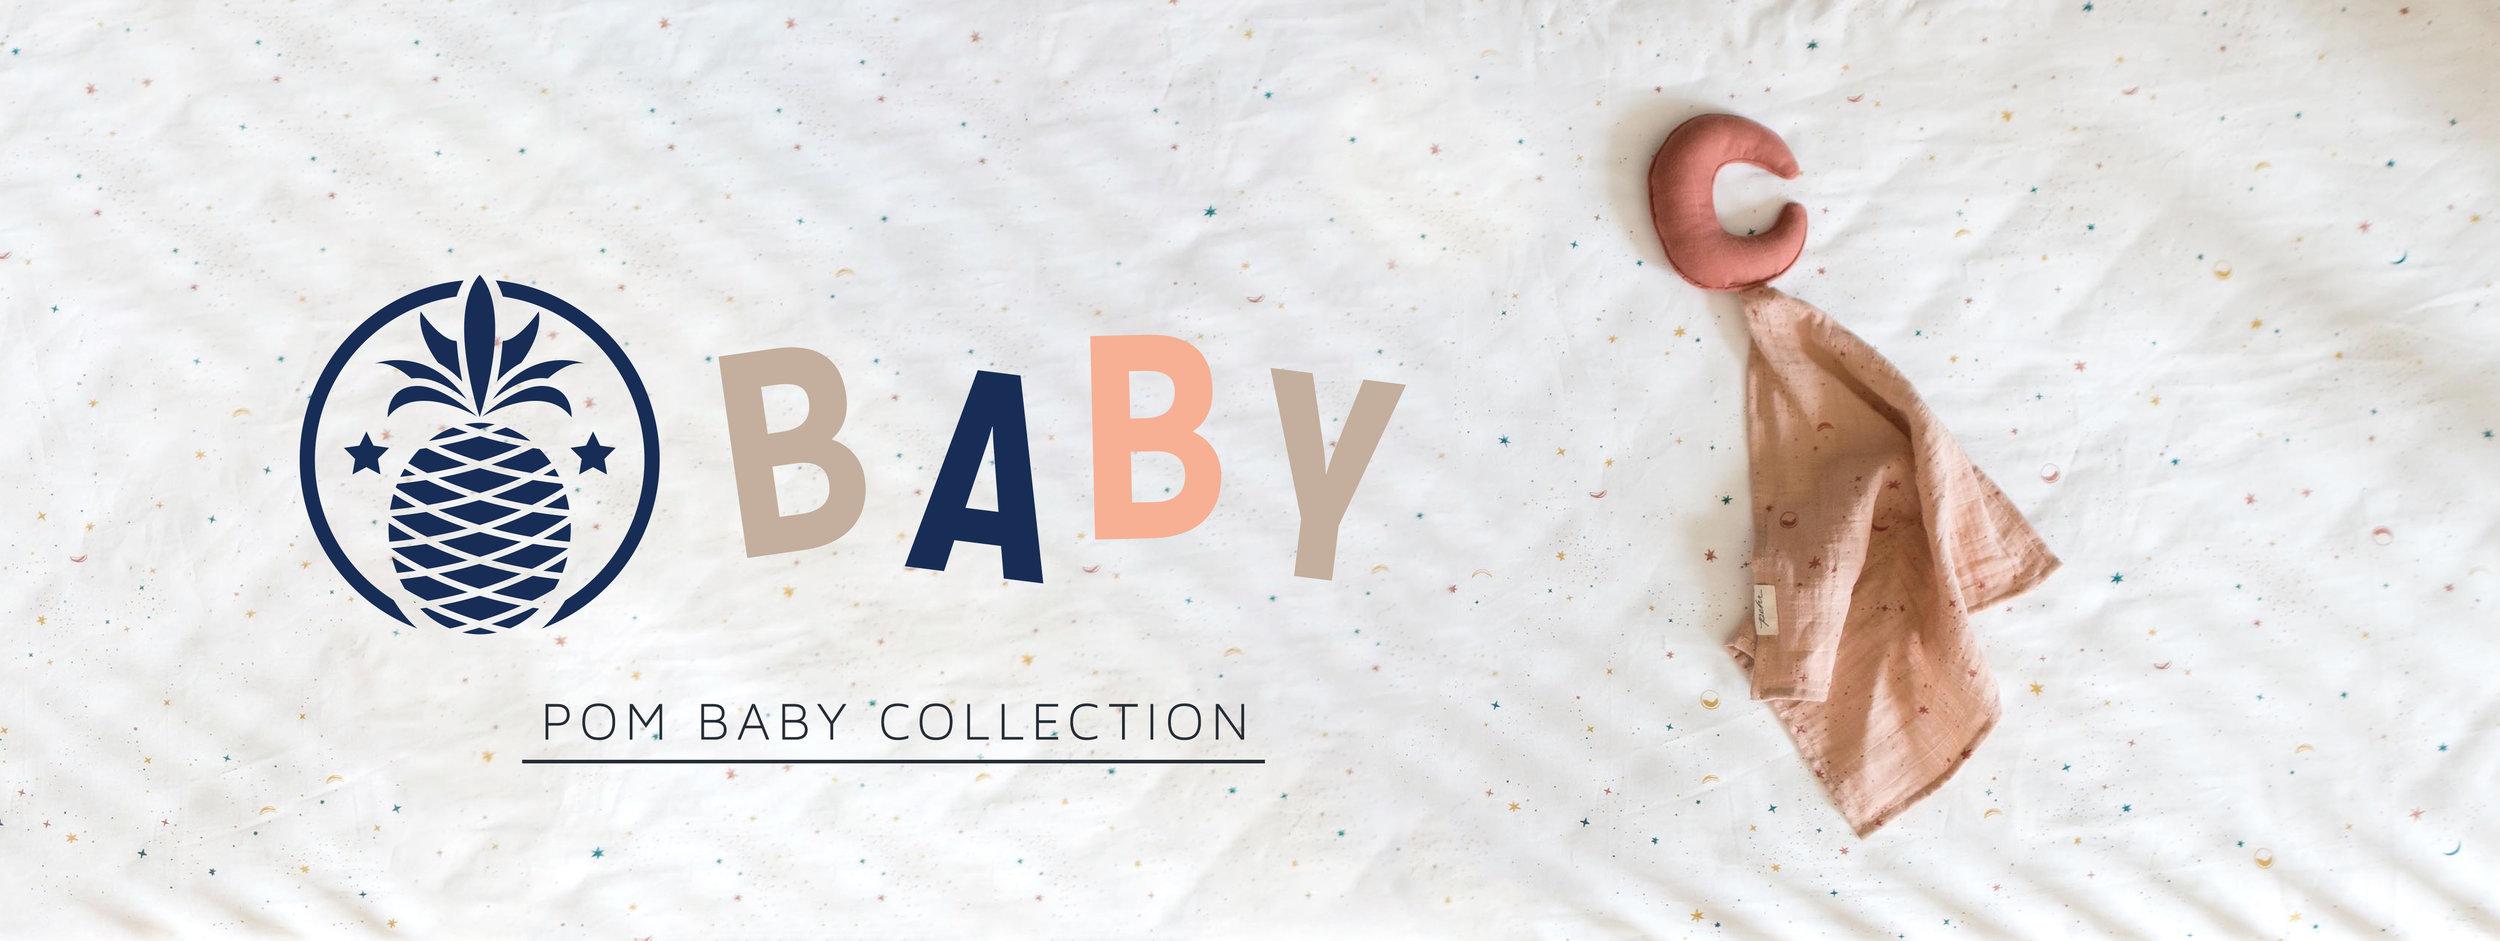 POM Baby Shop All Header Image